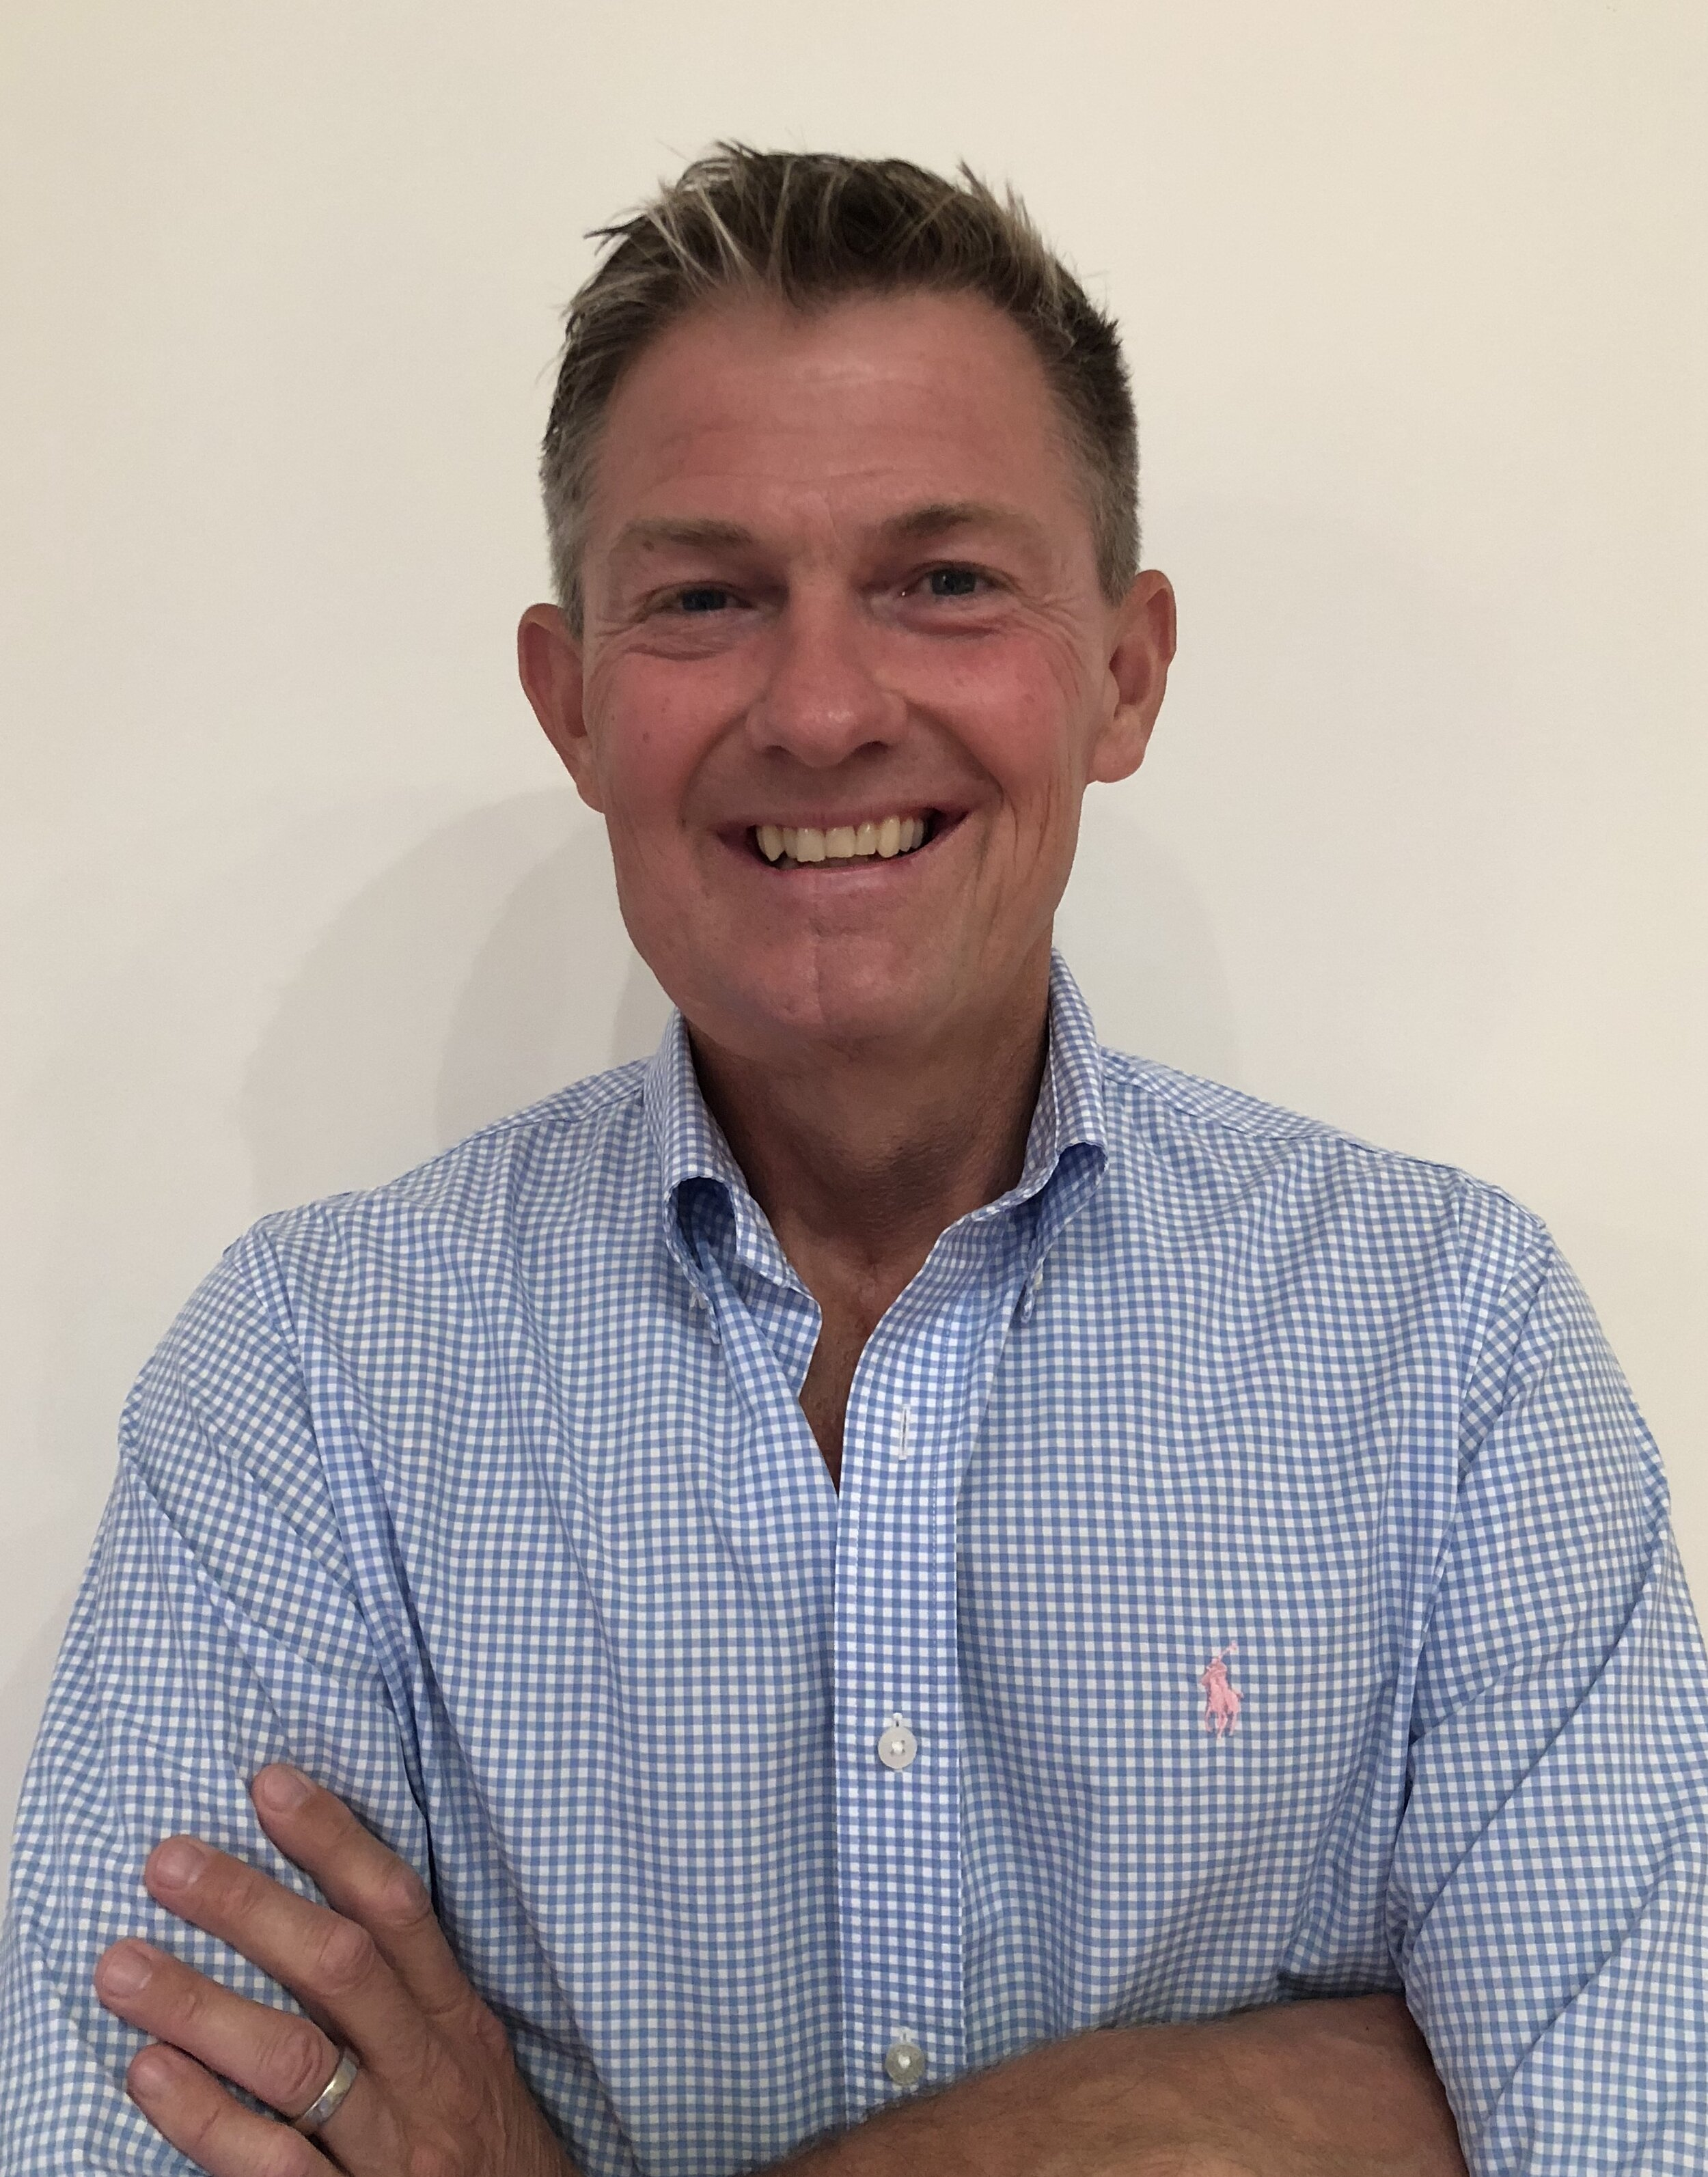 Mats Åkesson - Sales